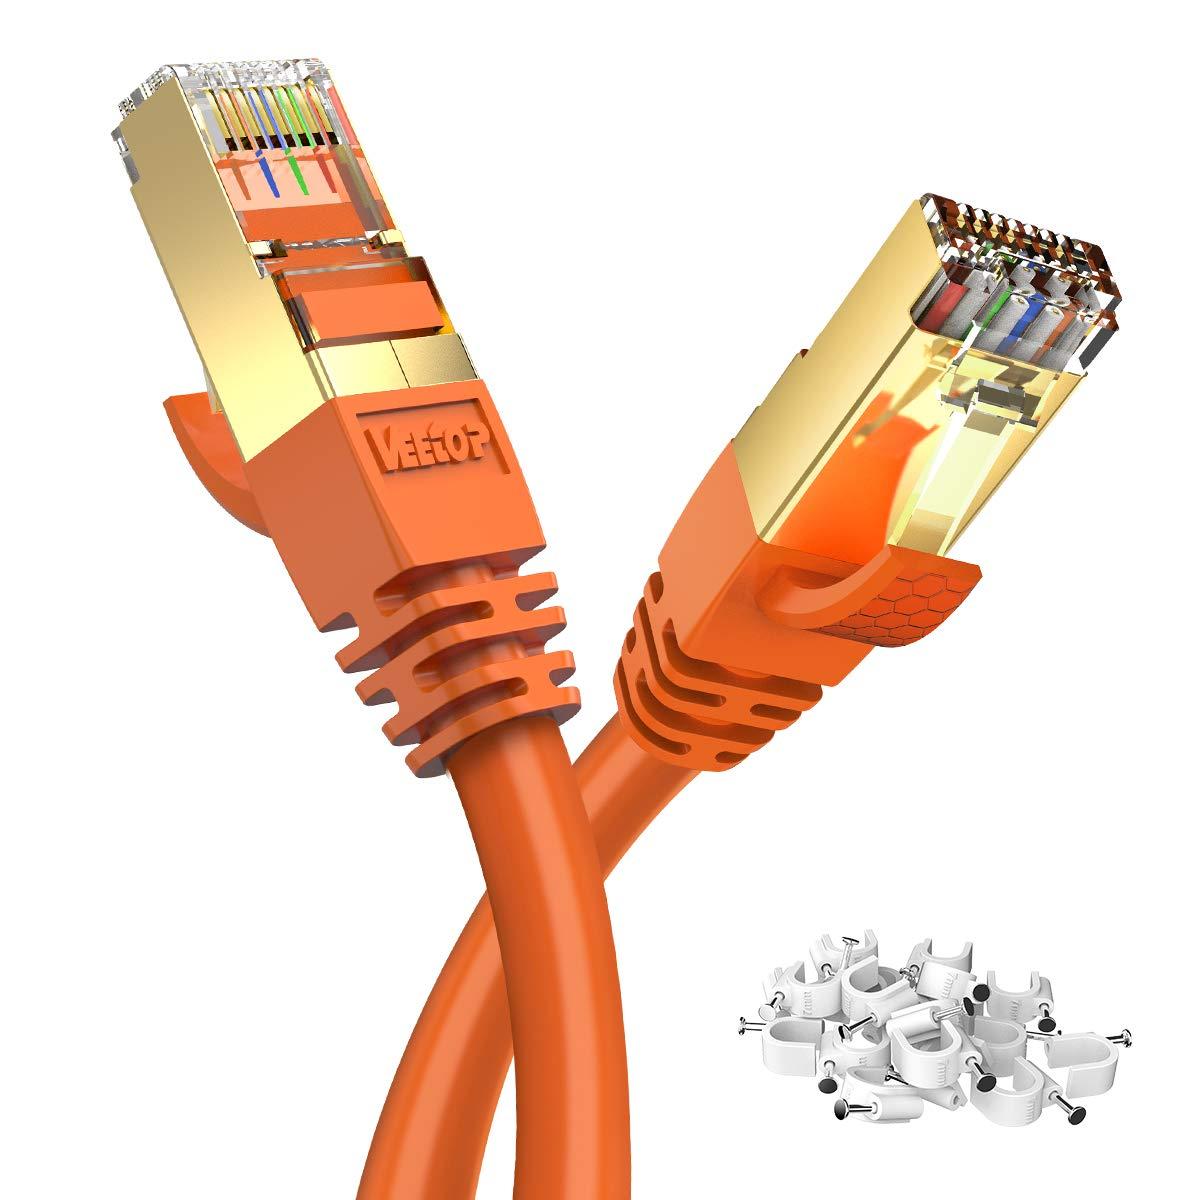 Veetop C/âble Ethernet LAN Cat 8 RJ45 C/âble R/éseau SFTP Vitesse 40 Gbps // 2000Mhz 0,5m Blanc